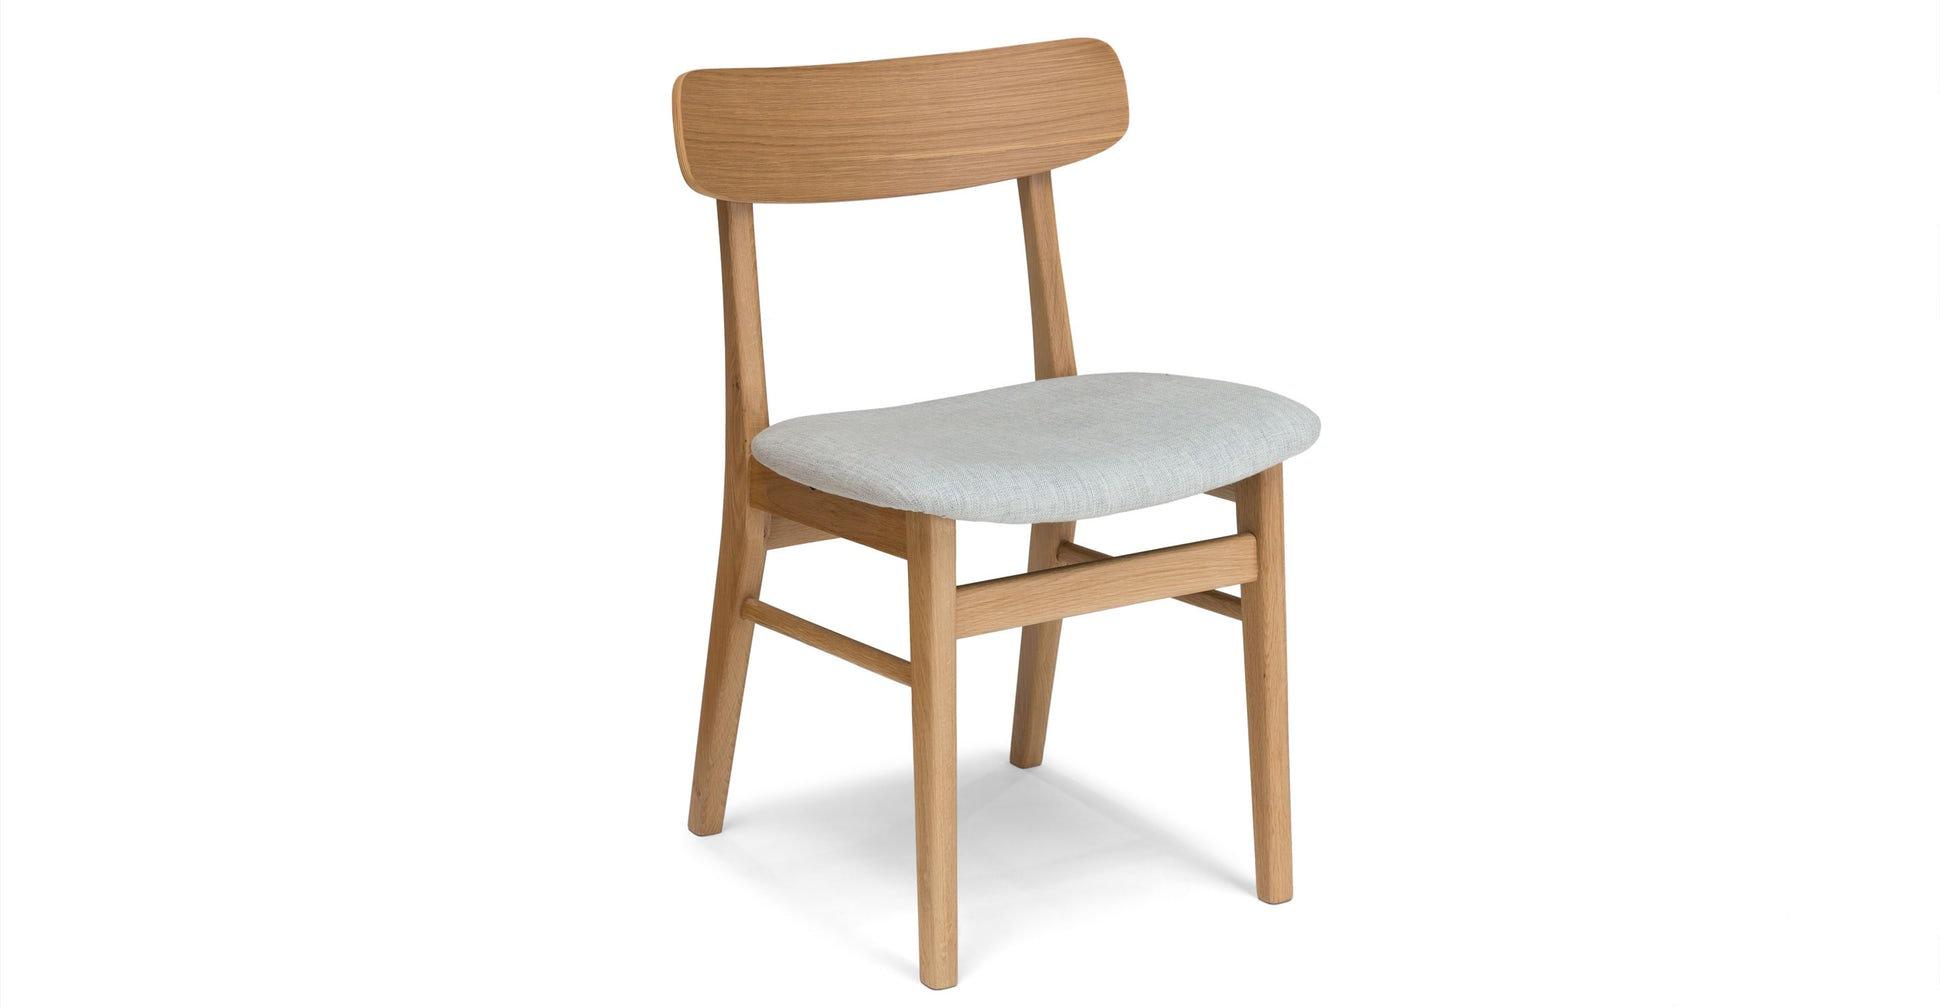 Four Chair (Bottom Cushion Cleaning)